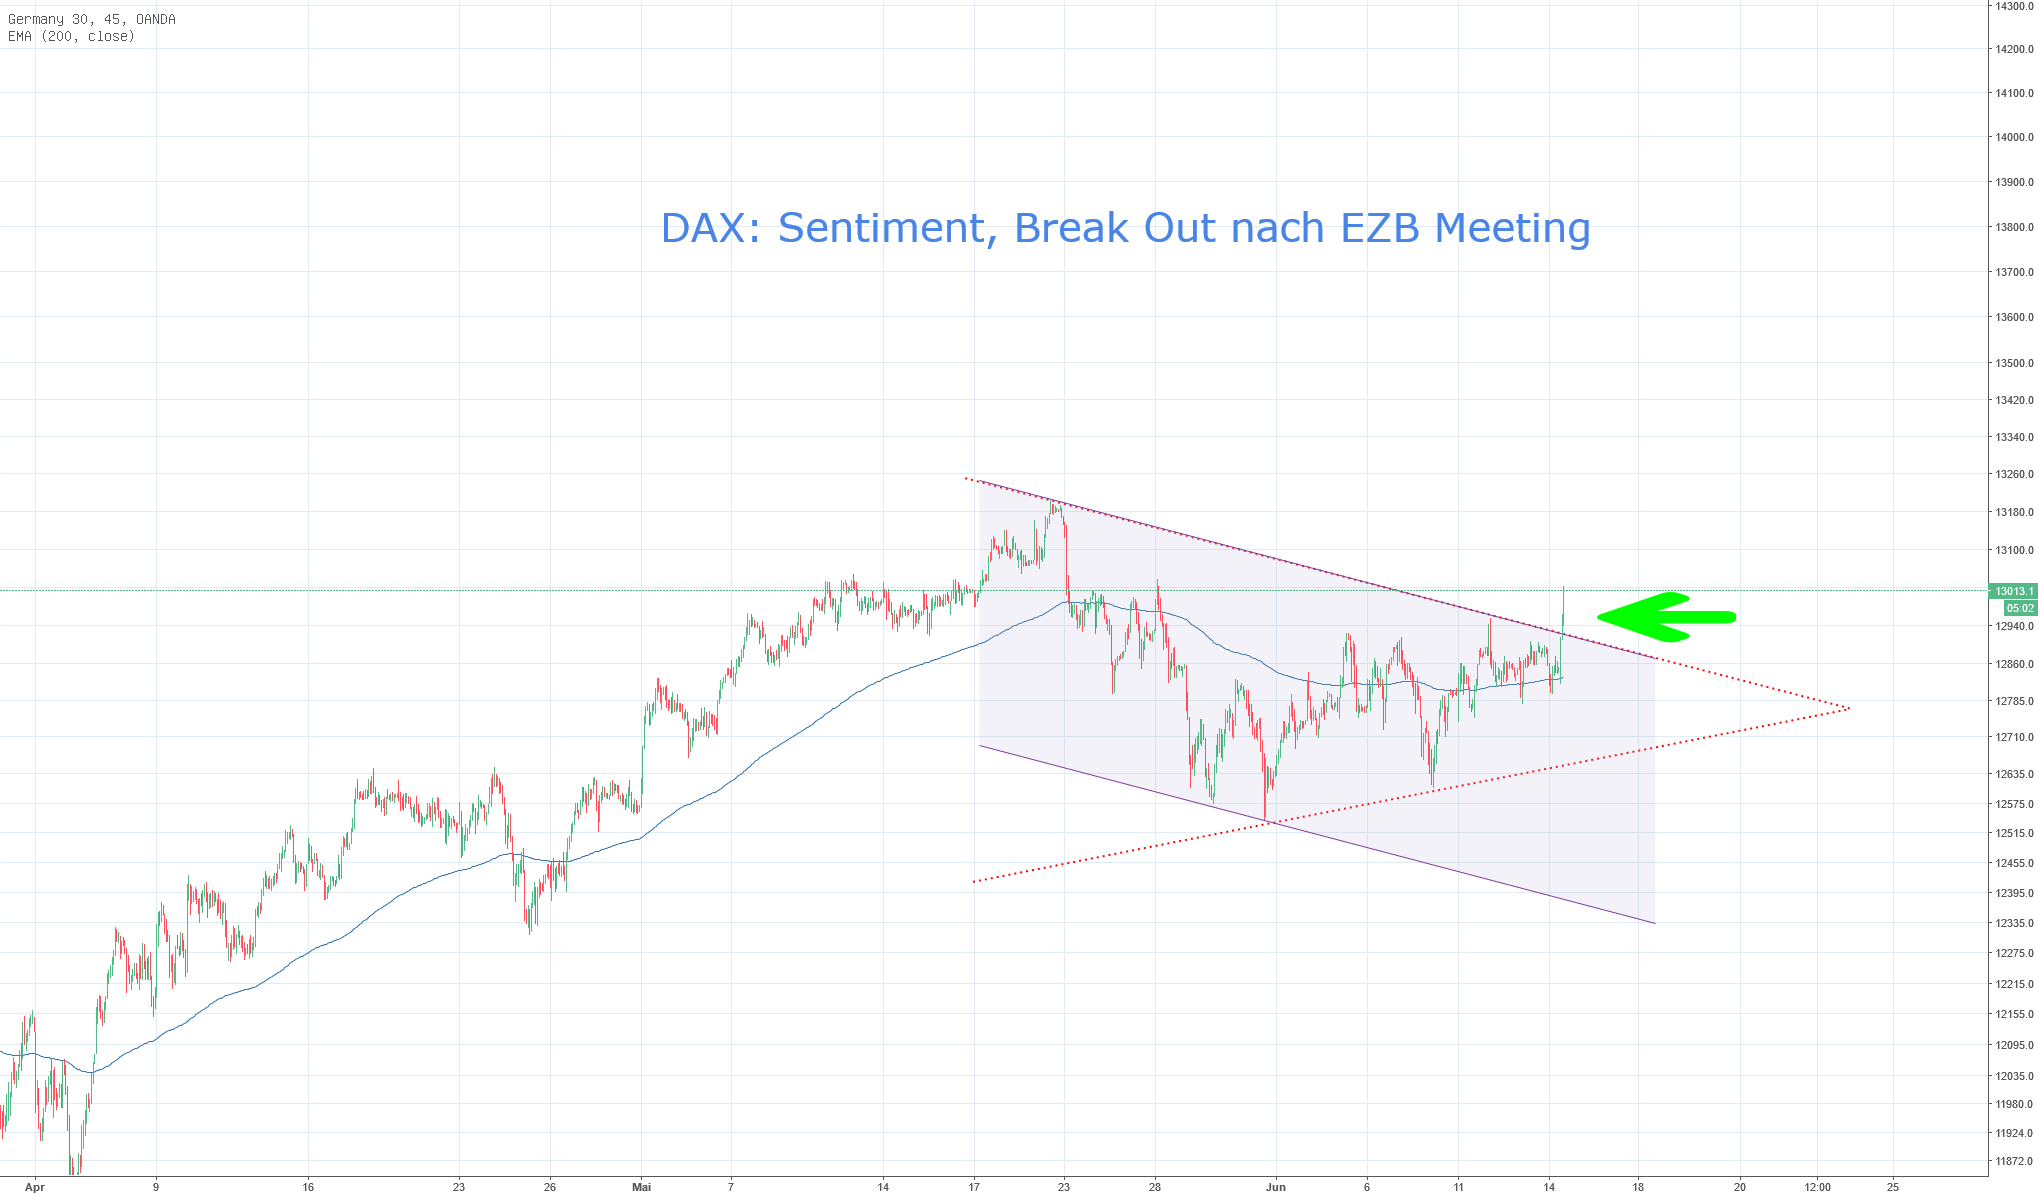 DAX: Sentiment, Break Out nach EZB Meeting